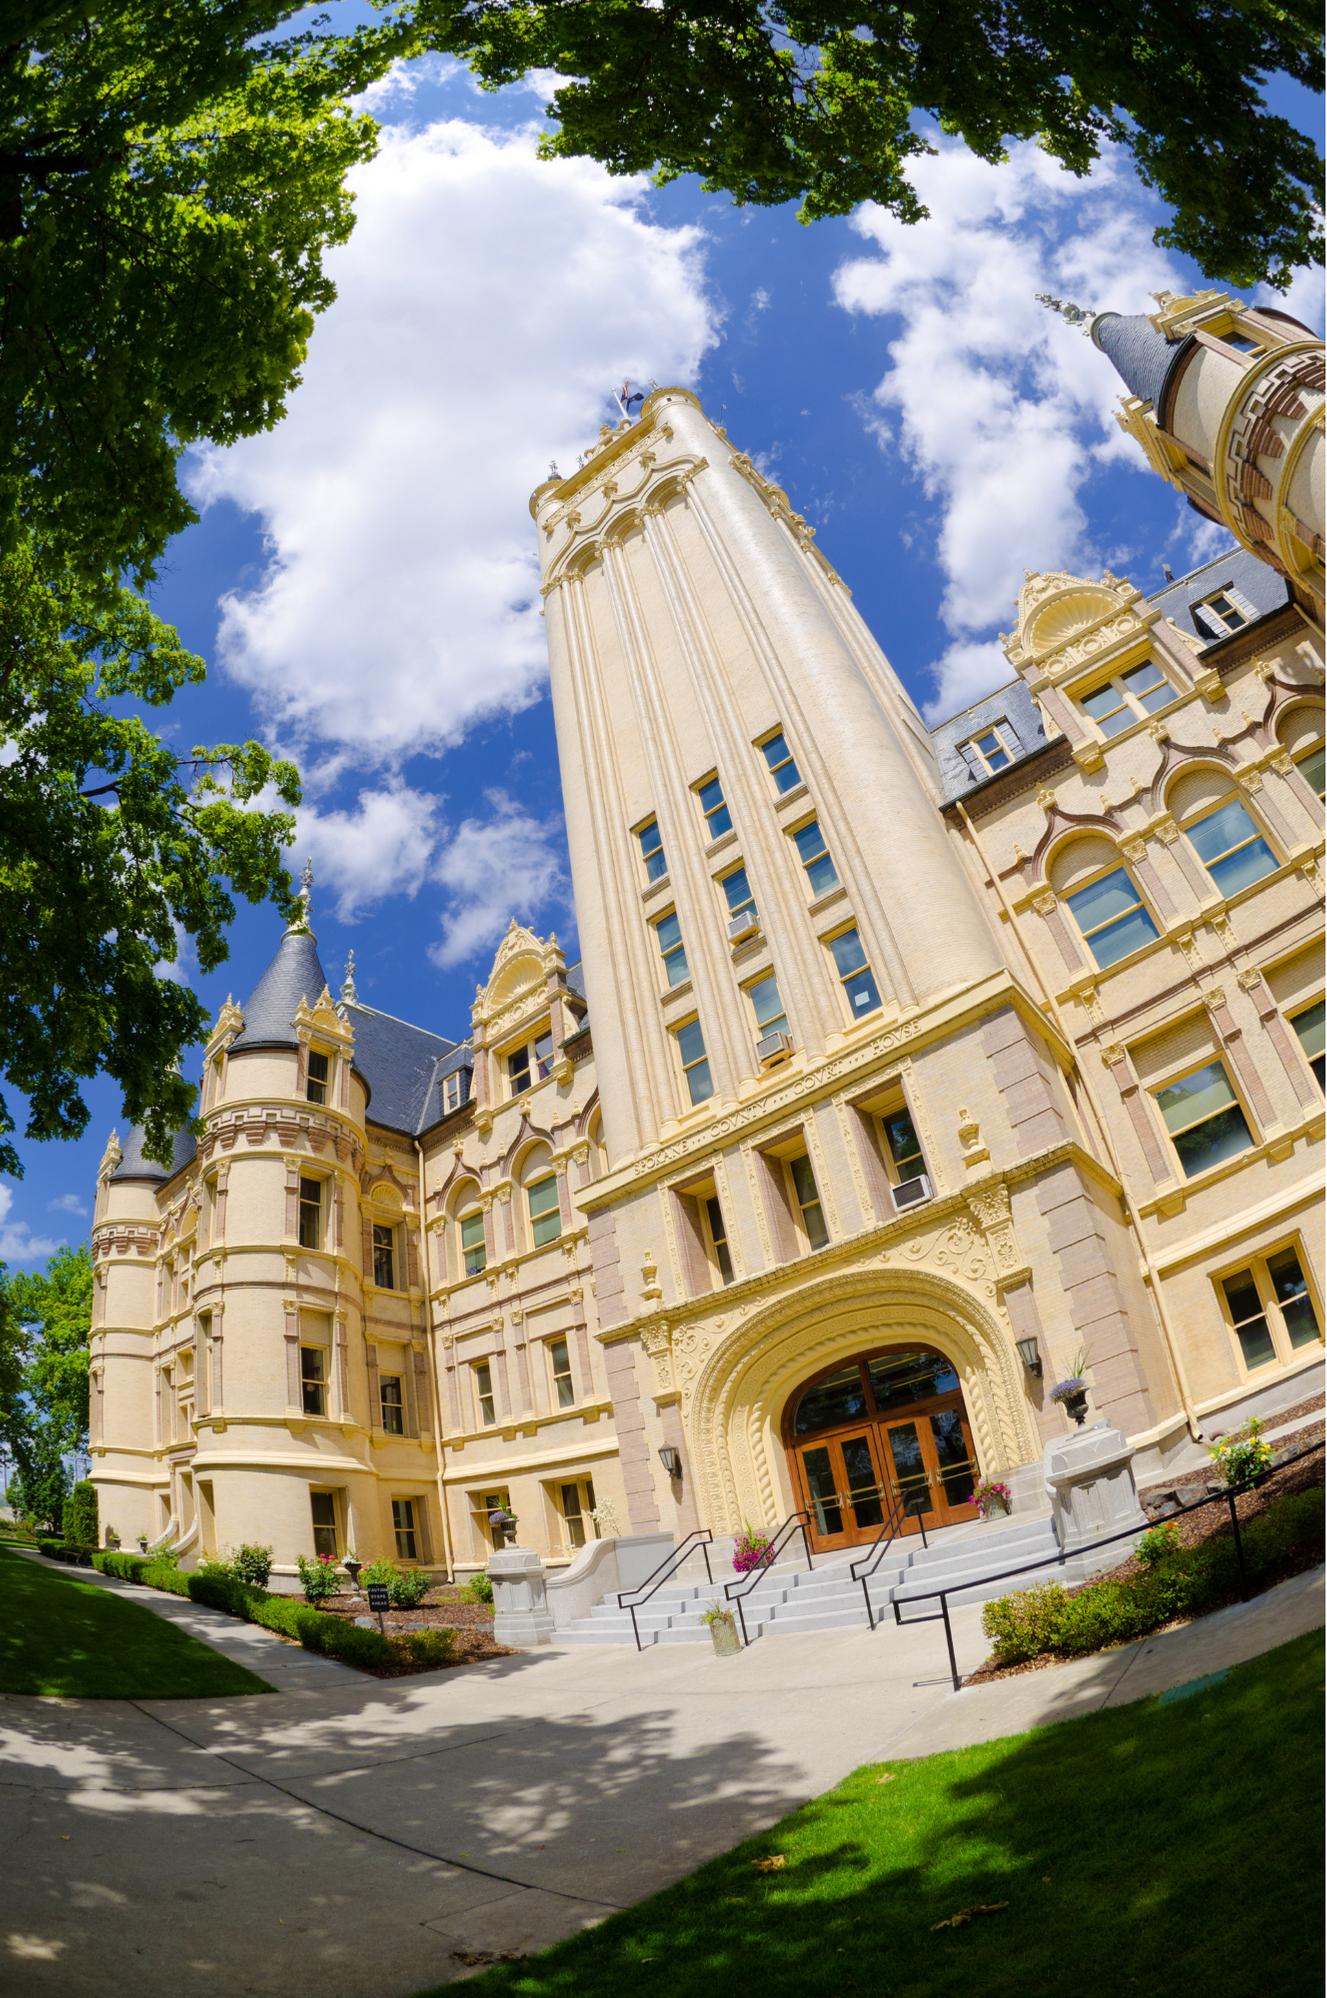 Photo of the Spokane County Courthouse